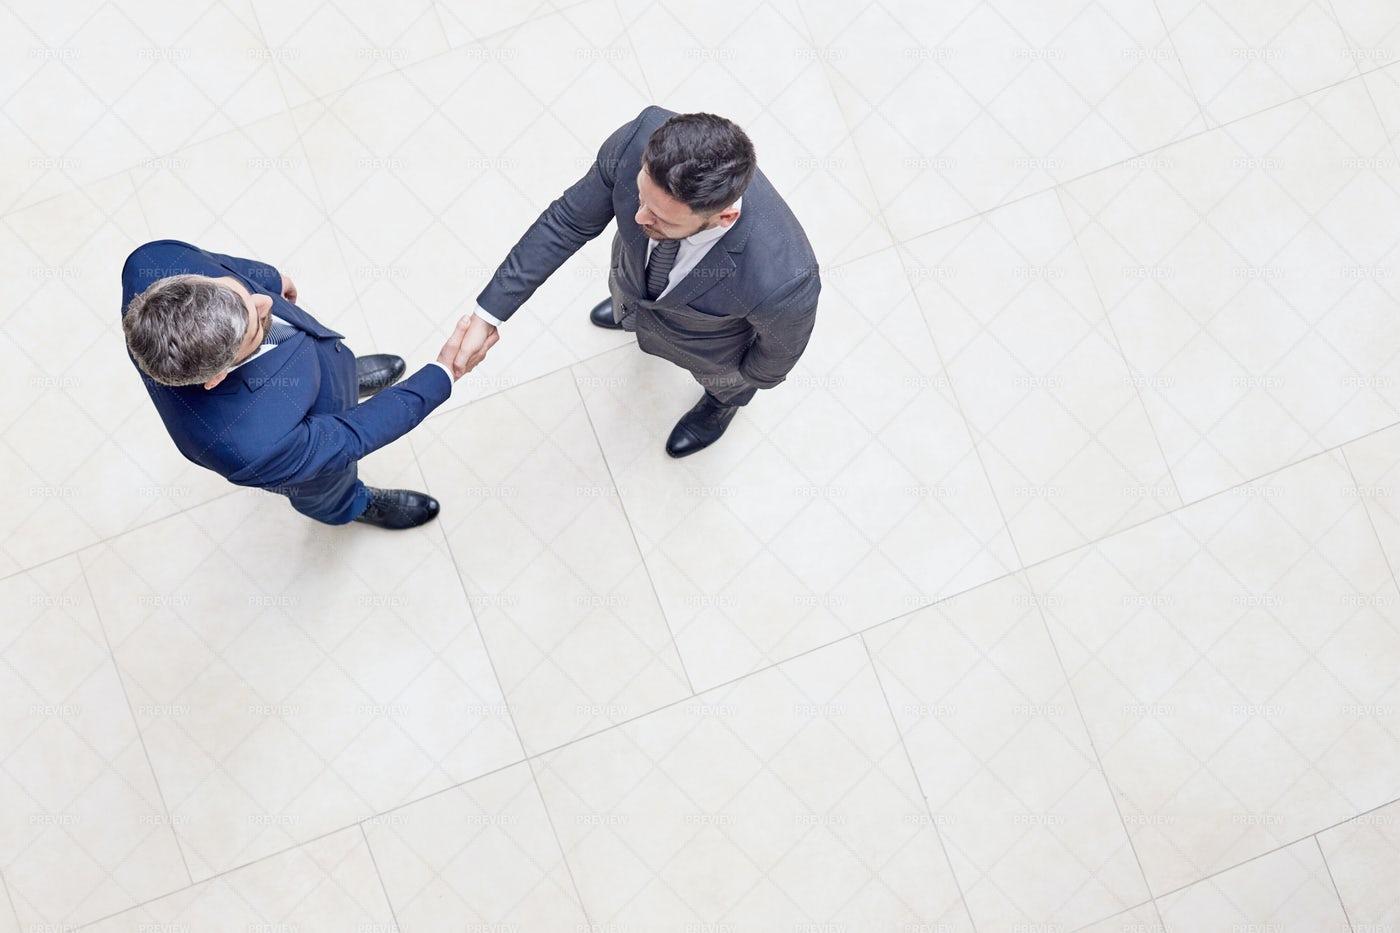 Confident Entrepreneurs Shaking...: Stock Photos